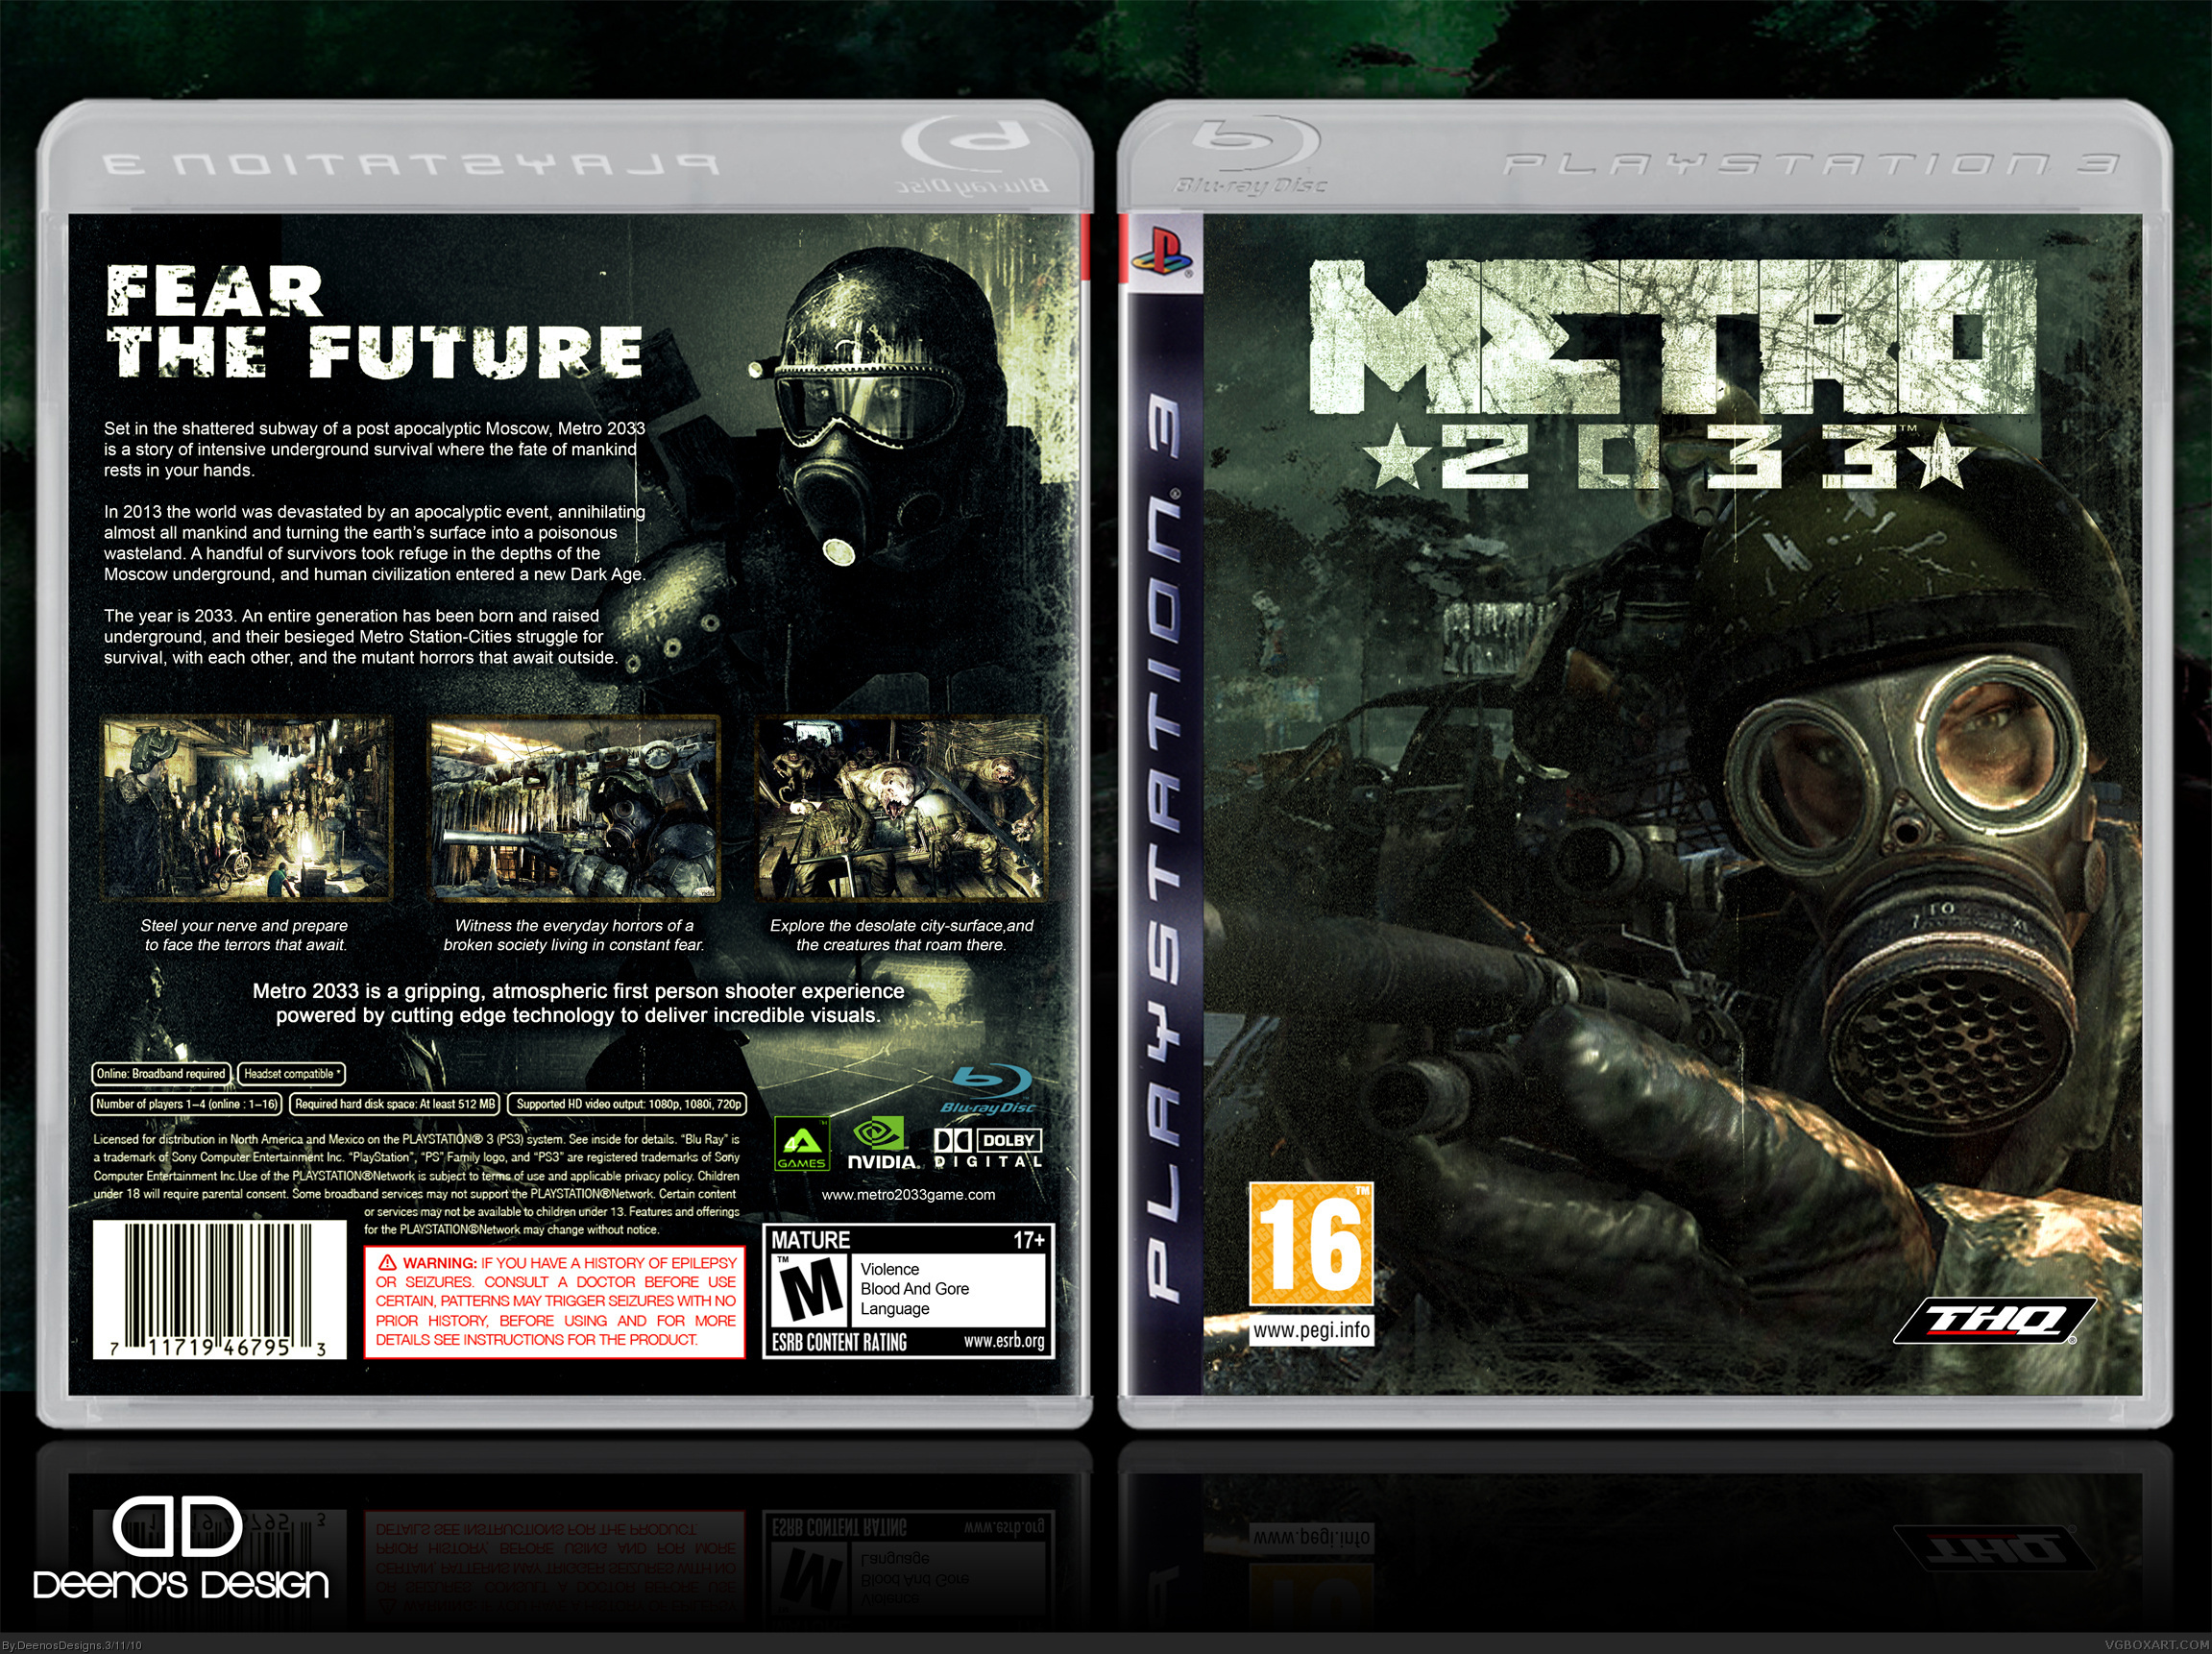 Metro 2033 PlayStation 3 Box Art Cover by DeenosDesigns2303